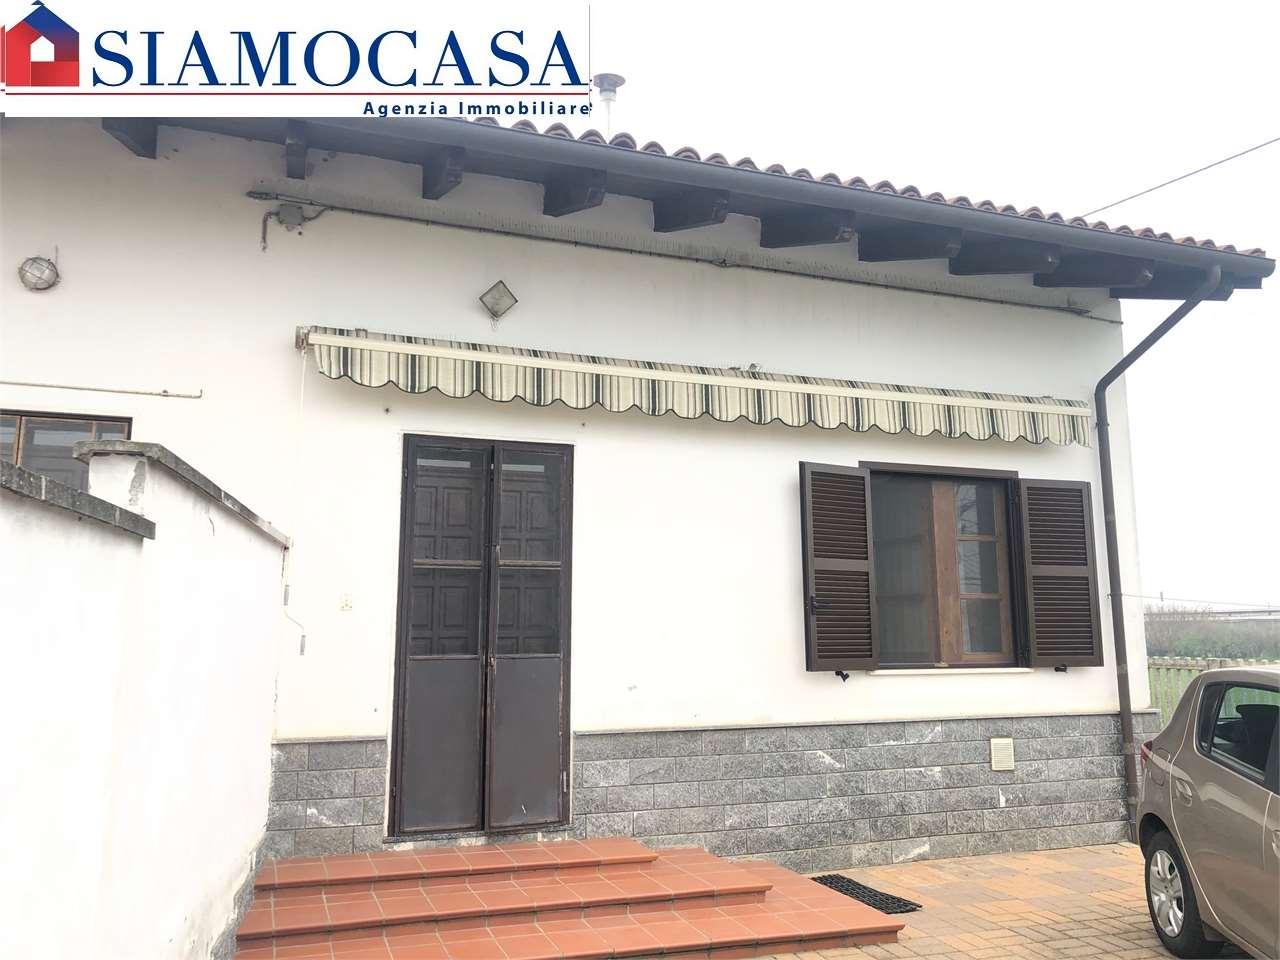 Vendita Casa Indipendente Casa/Villa Alessandria 231600